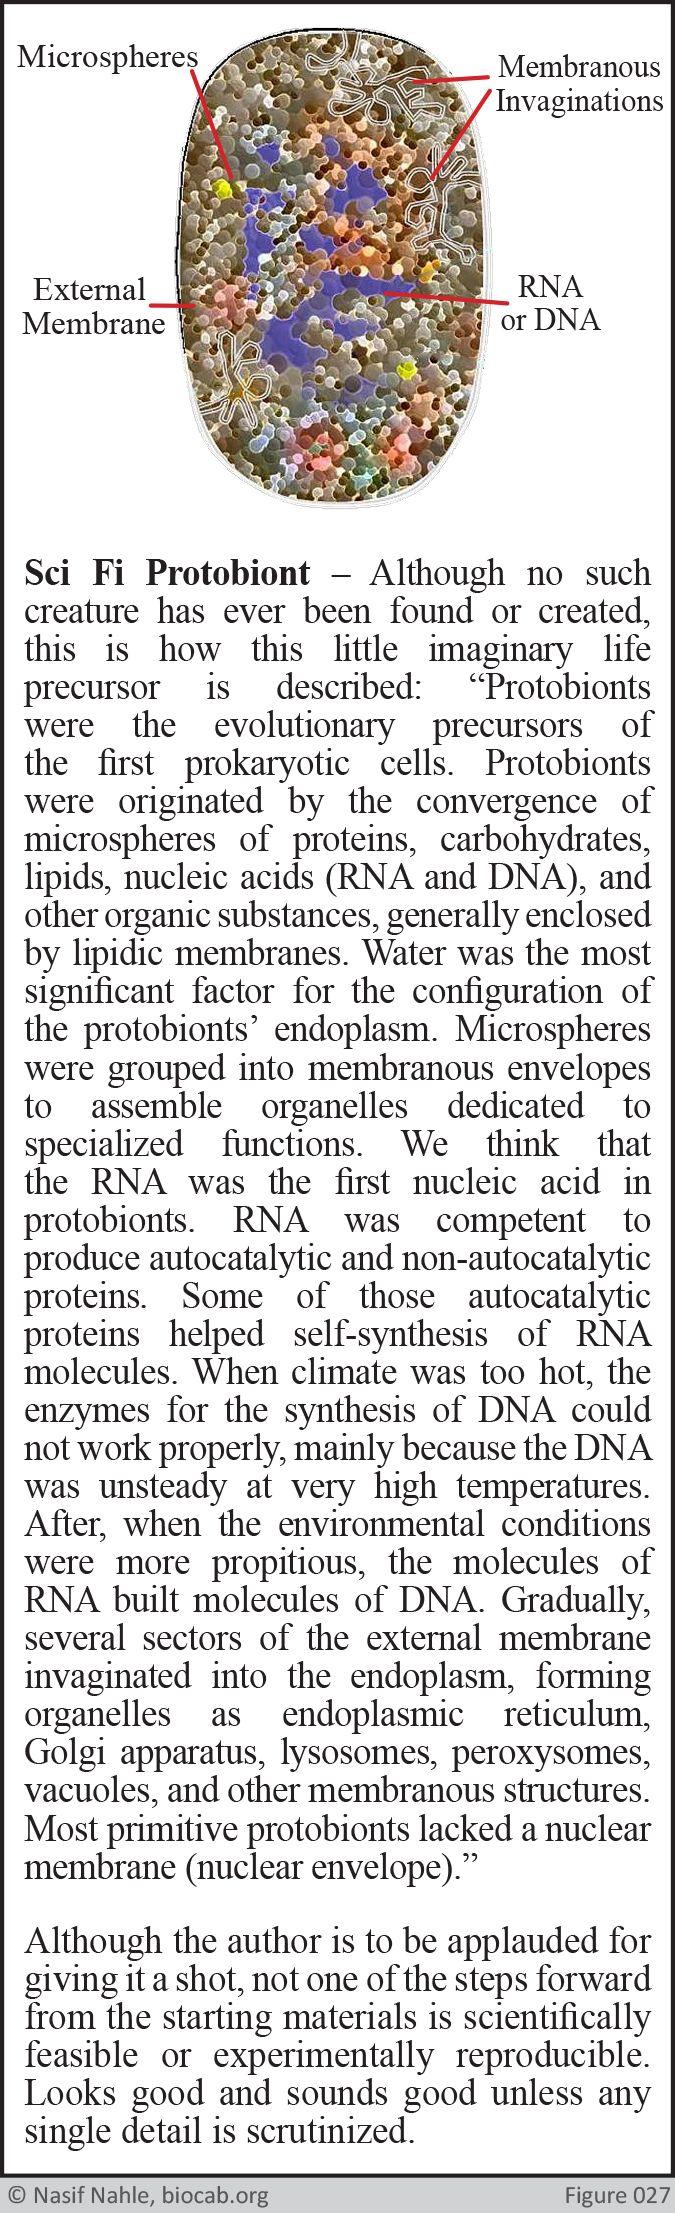 Sci Fi Protobiont